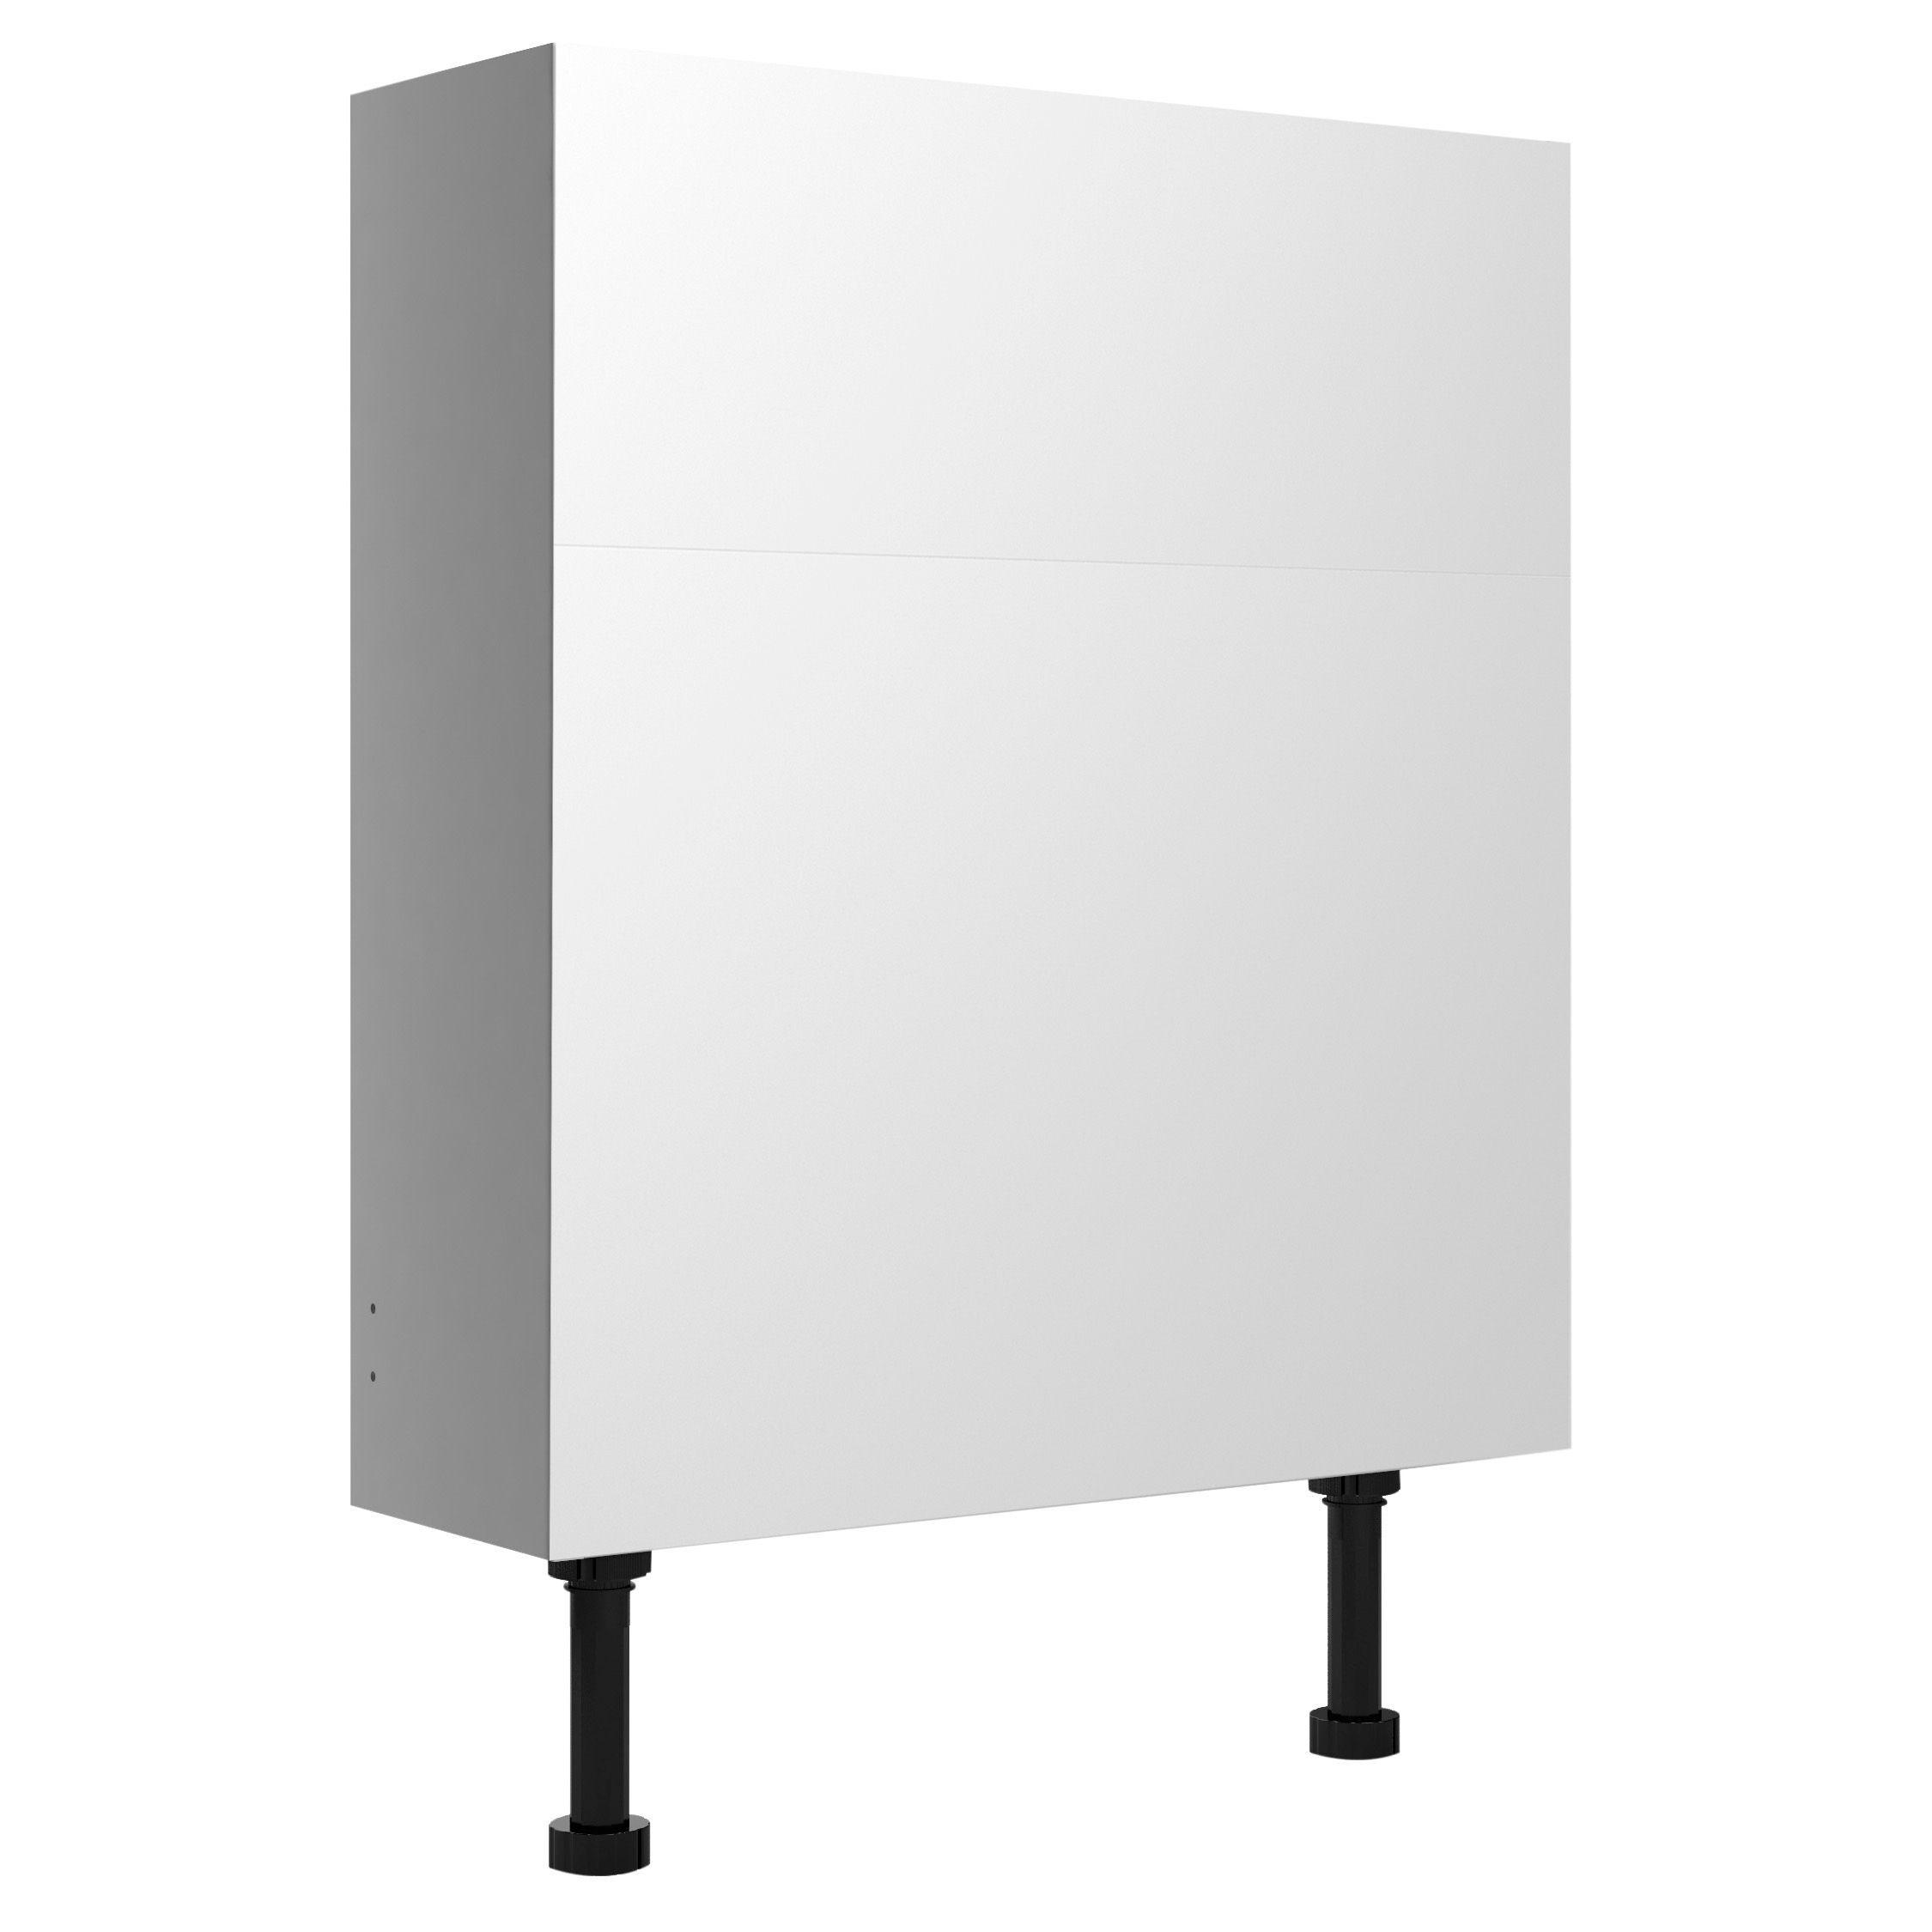 Cooke & Lewis Marletti Gloss White Slimline Toilet Unit, (w)600mm